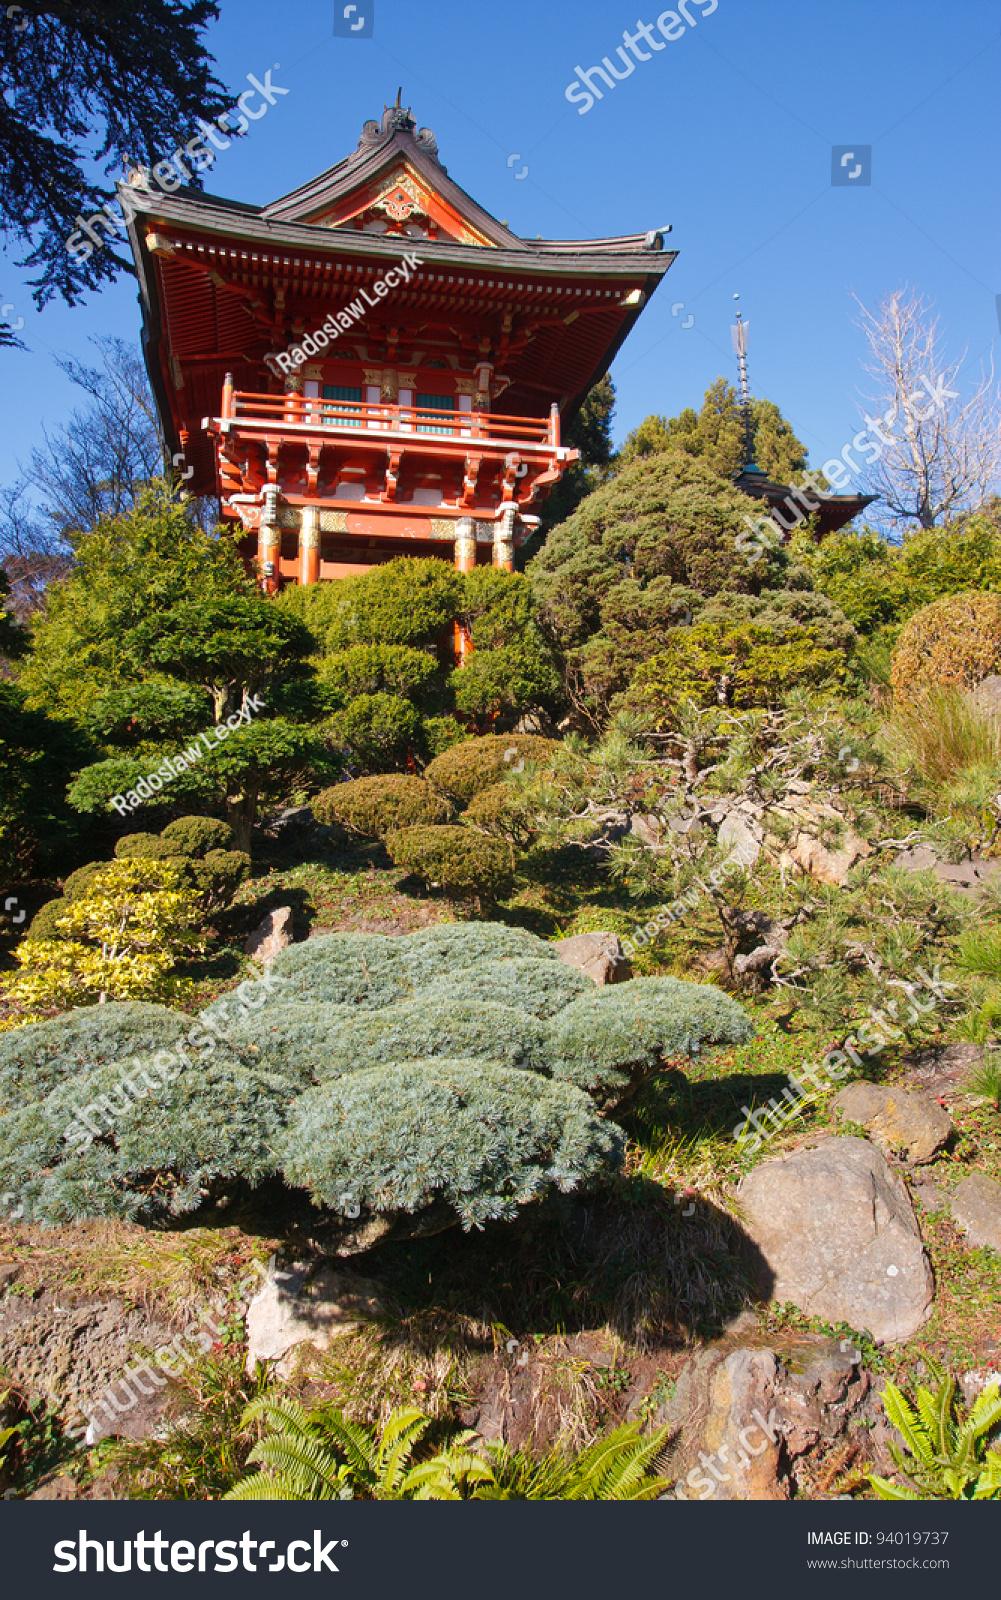 Pagoda In Japanese Tea Garden In Golden Gate Park San Francisco Stock Photo 94019737 Shutterstock